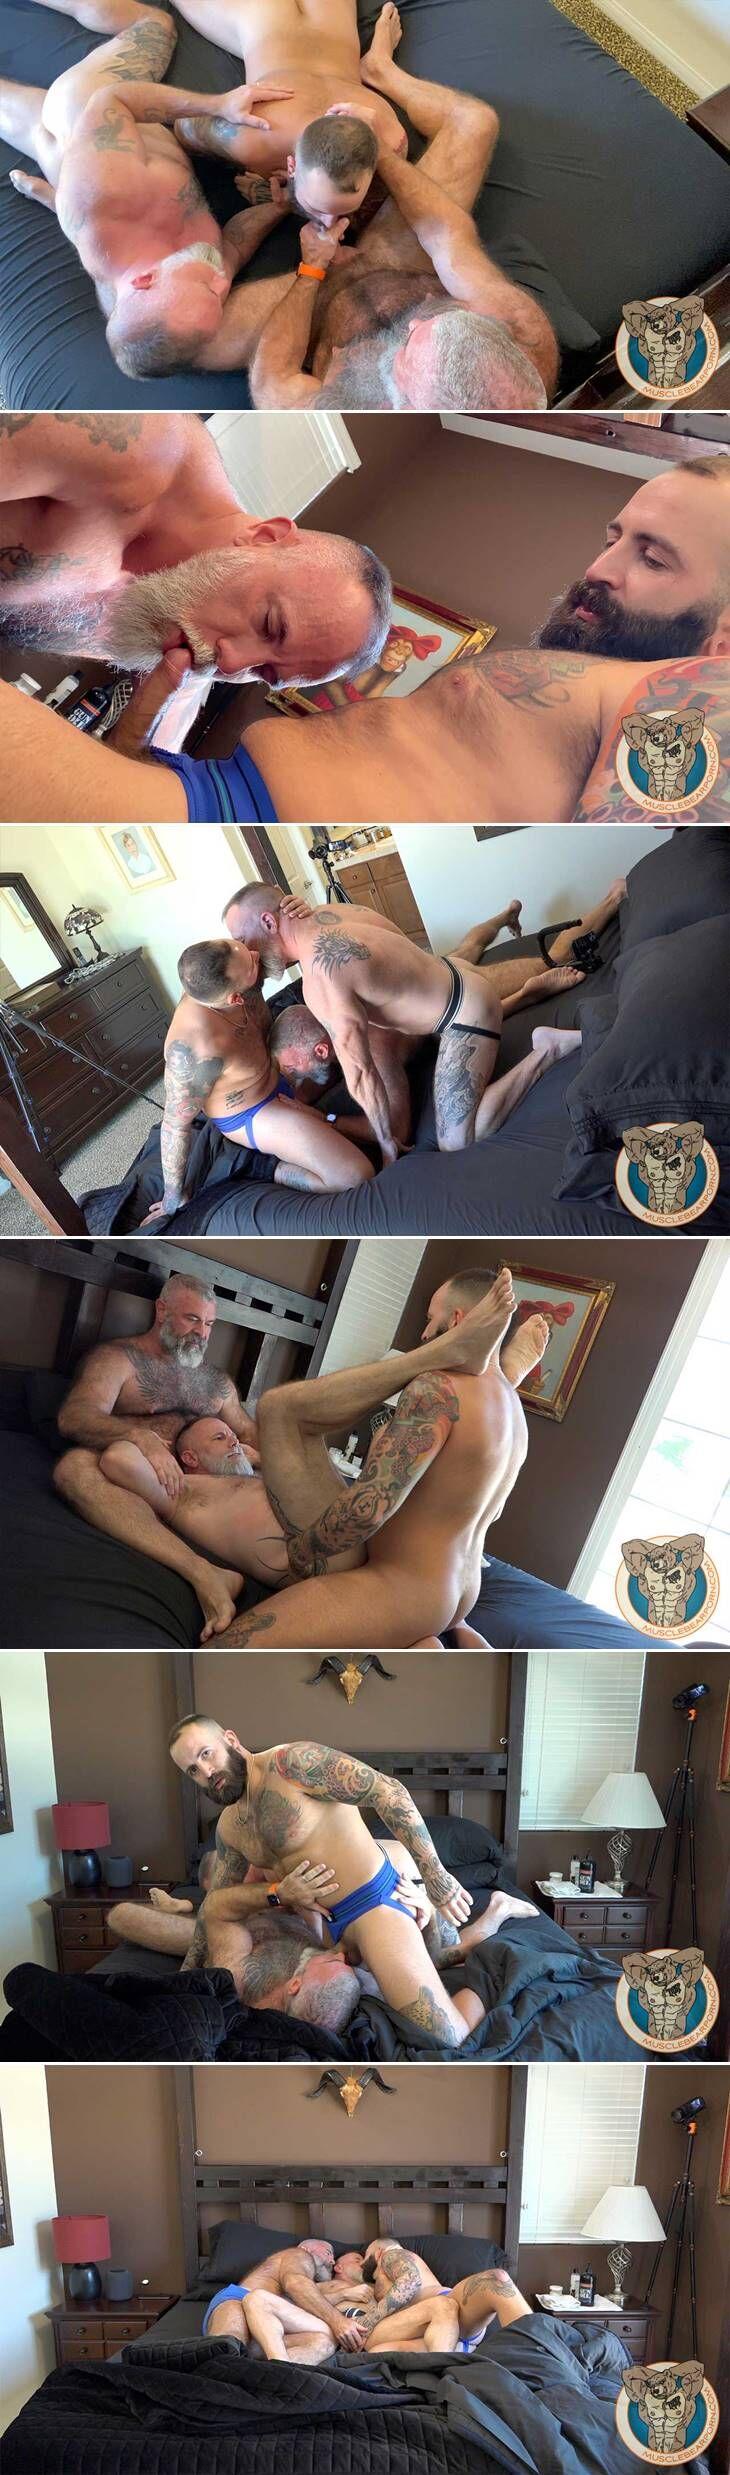 Muscle Bear Porn: Threesome with Zander Fierro